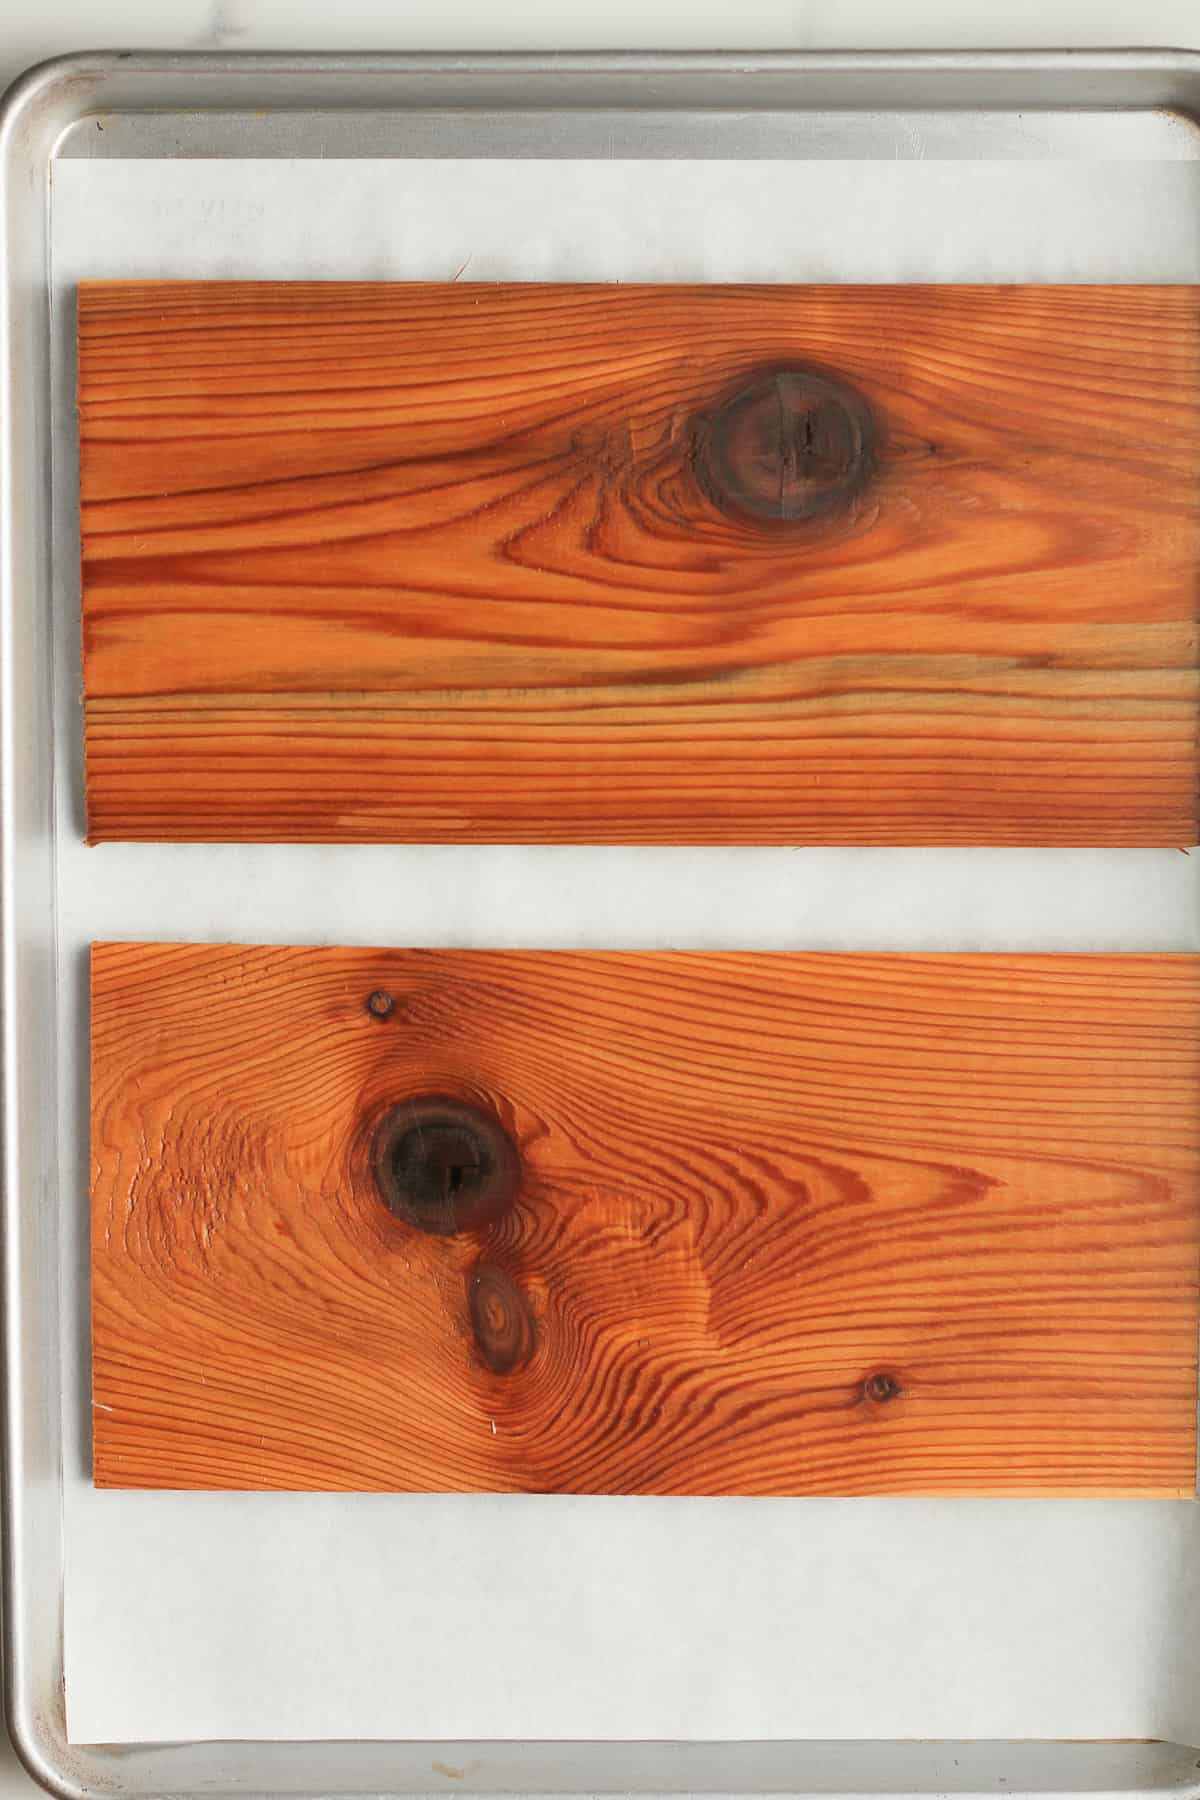 Two cedar planks after soaking.